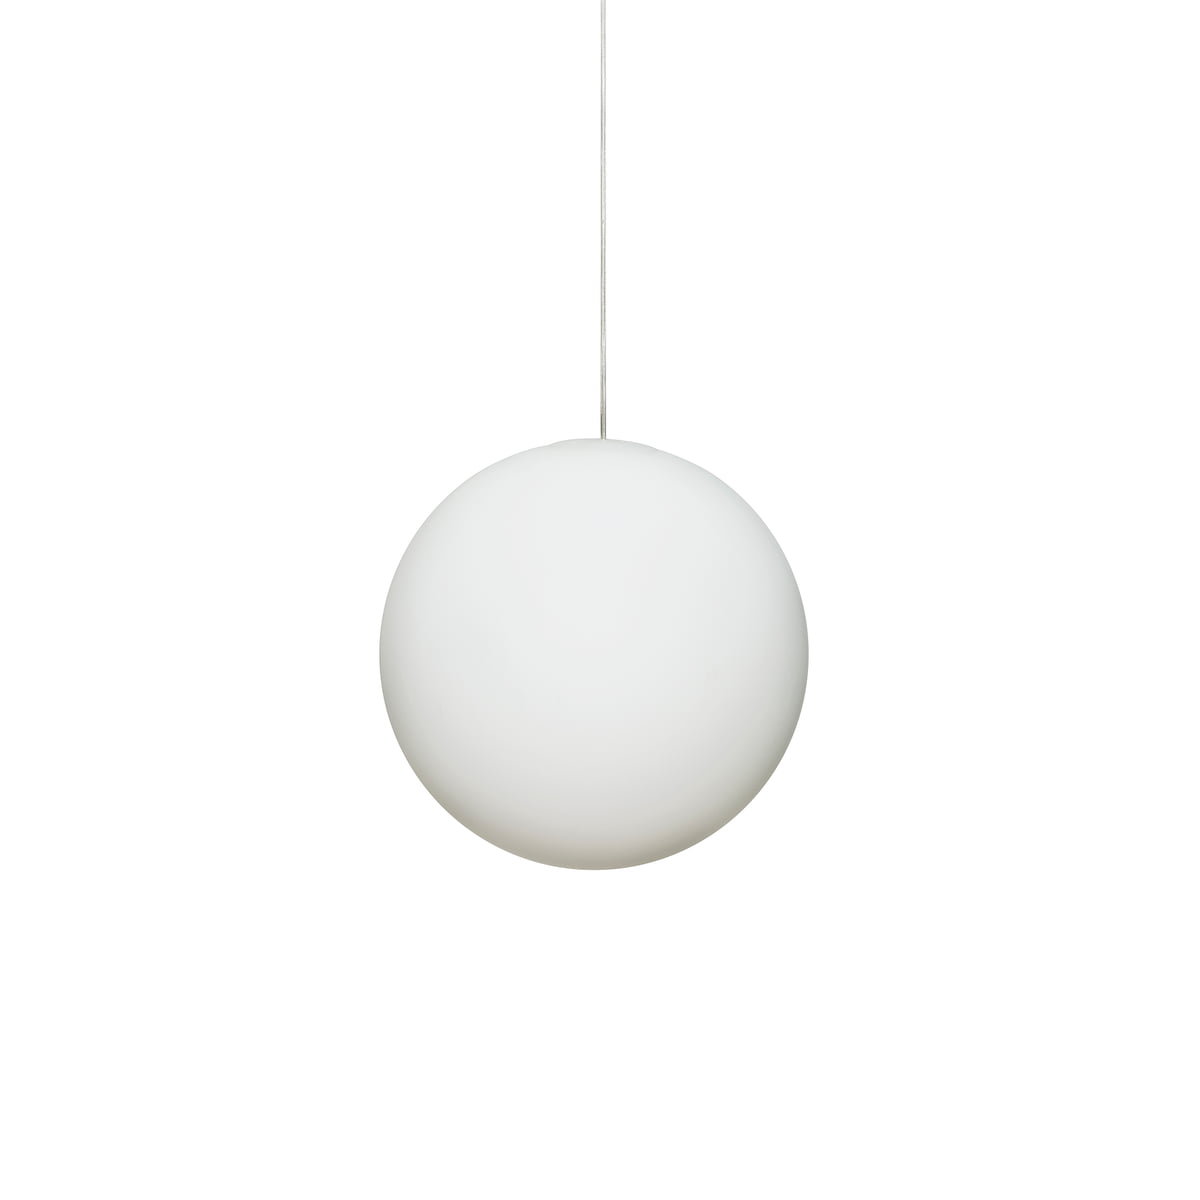 Design House Stockholm Luna Pendelleuchte Ø 16 cm, weiß